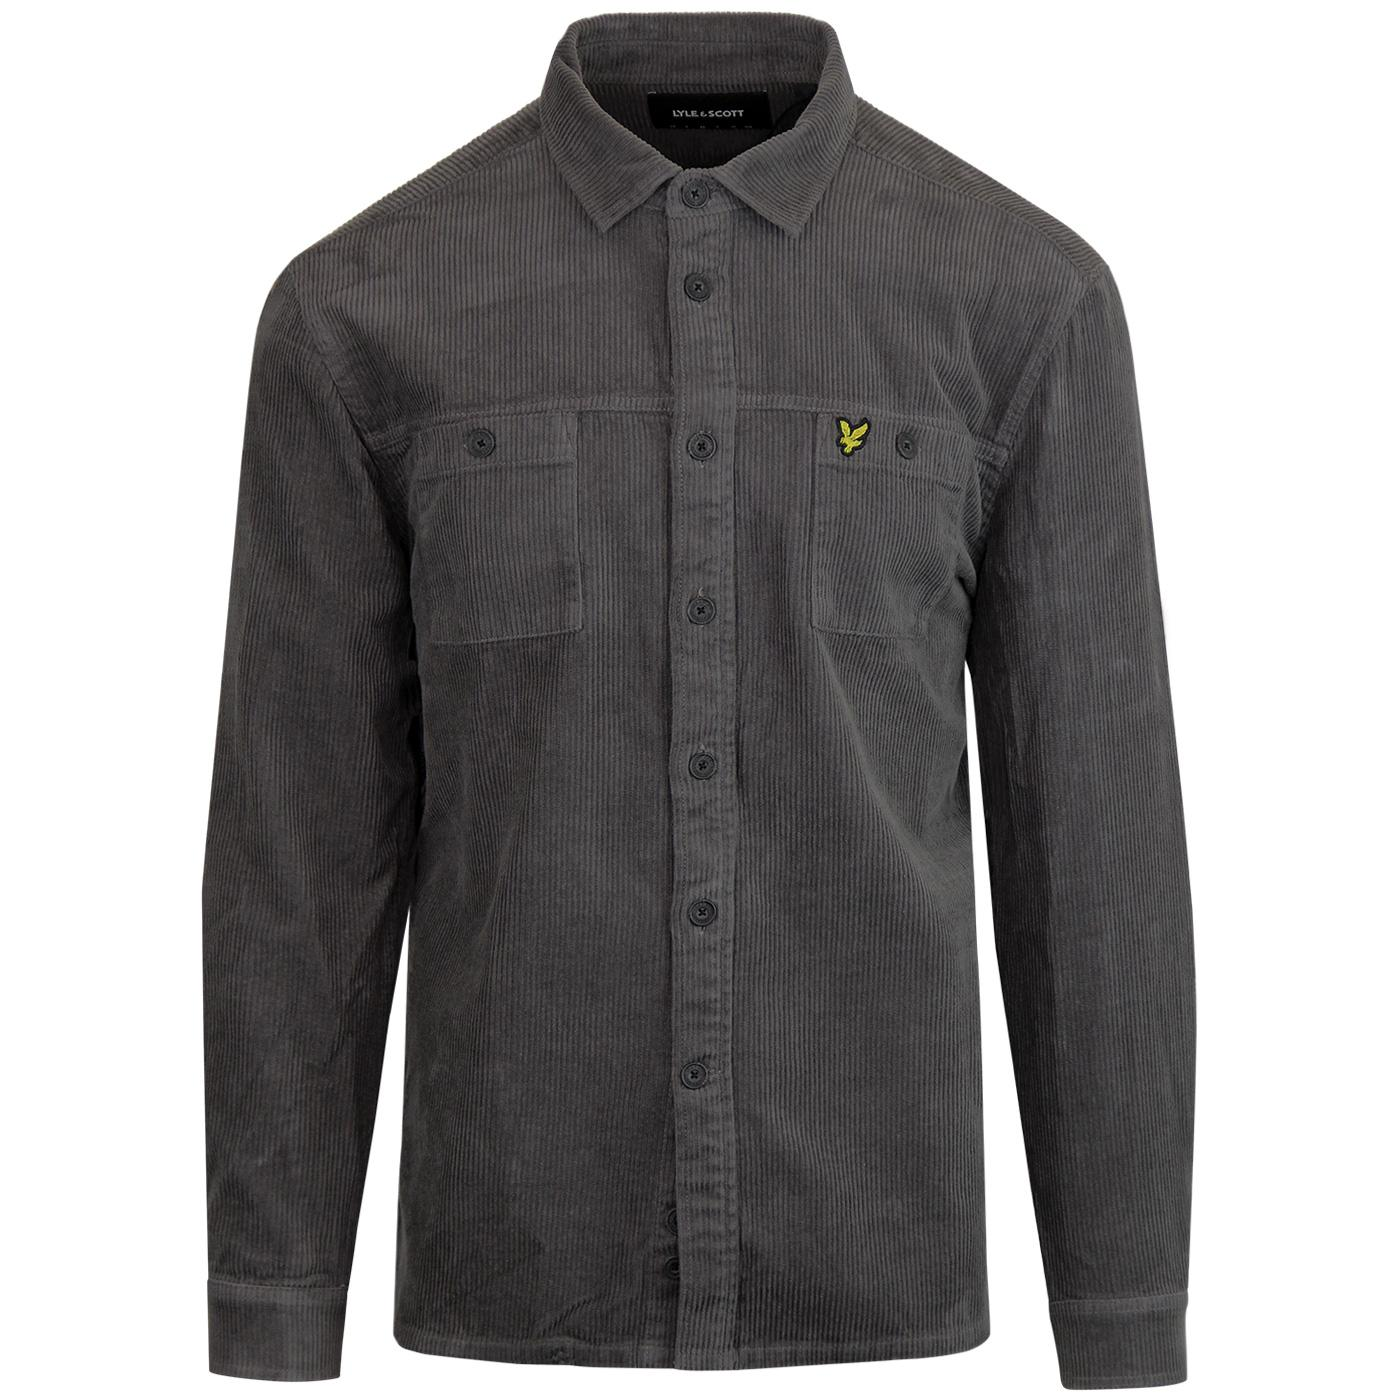 LYLE & SCOTT Retro Mod Jumbo Cord Overshirt (Grey)